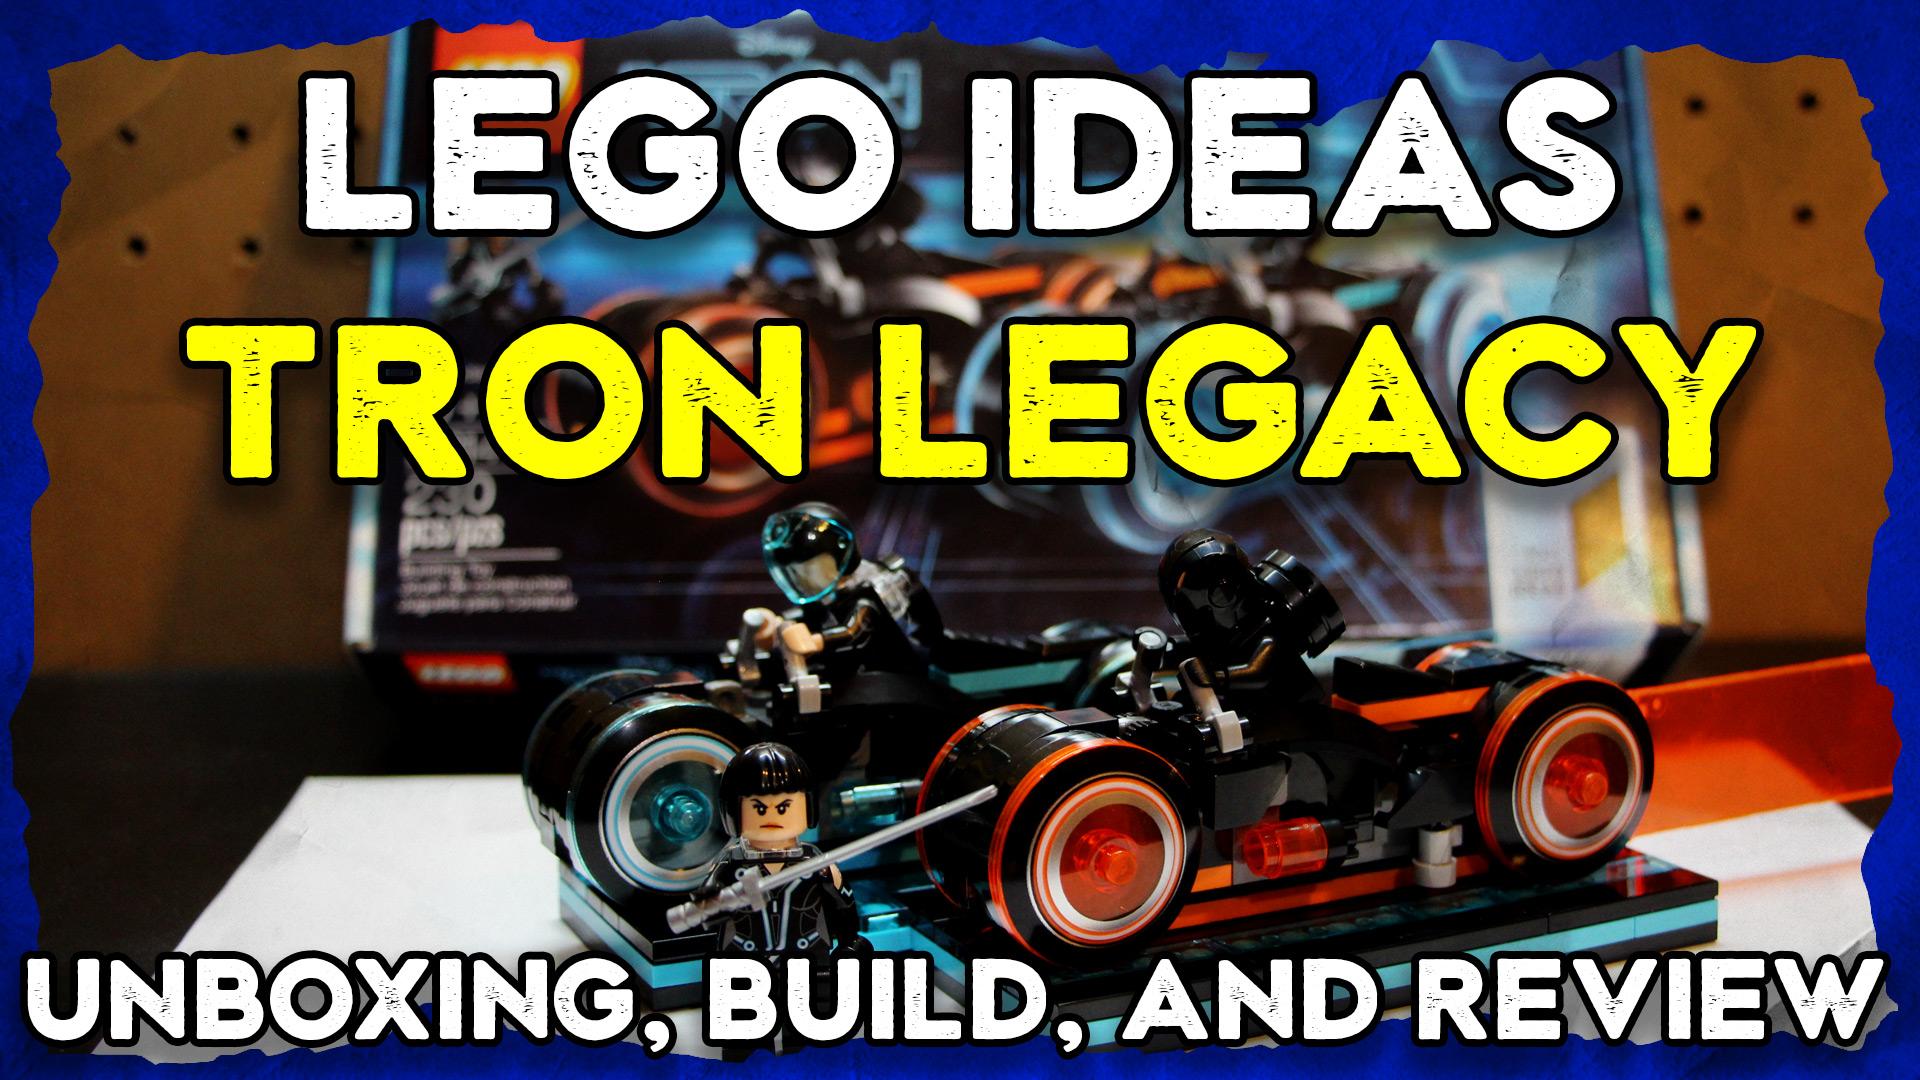 Lego Ideas Tron Legacy